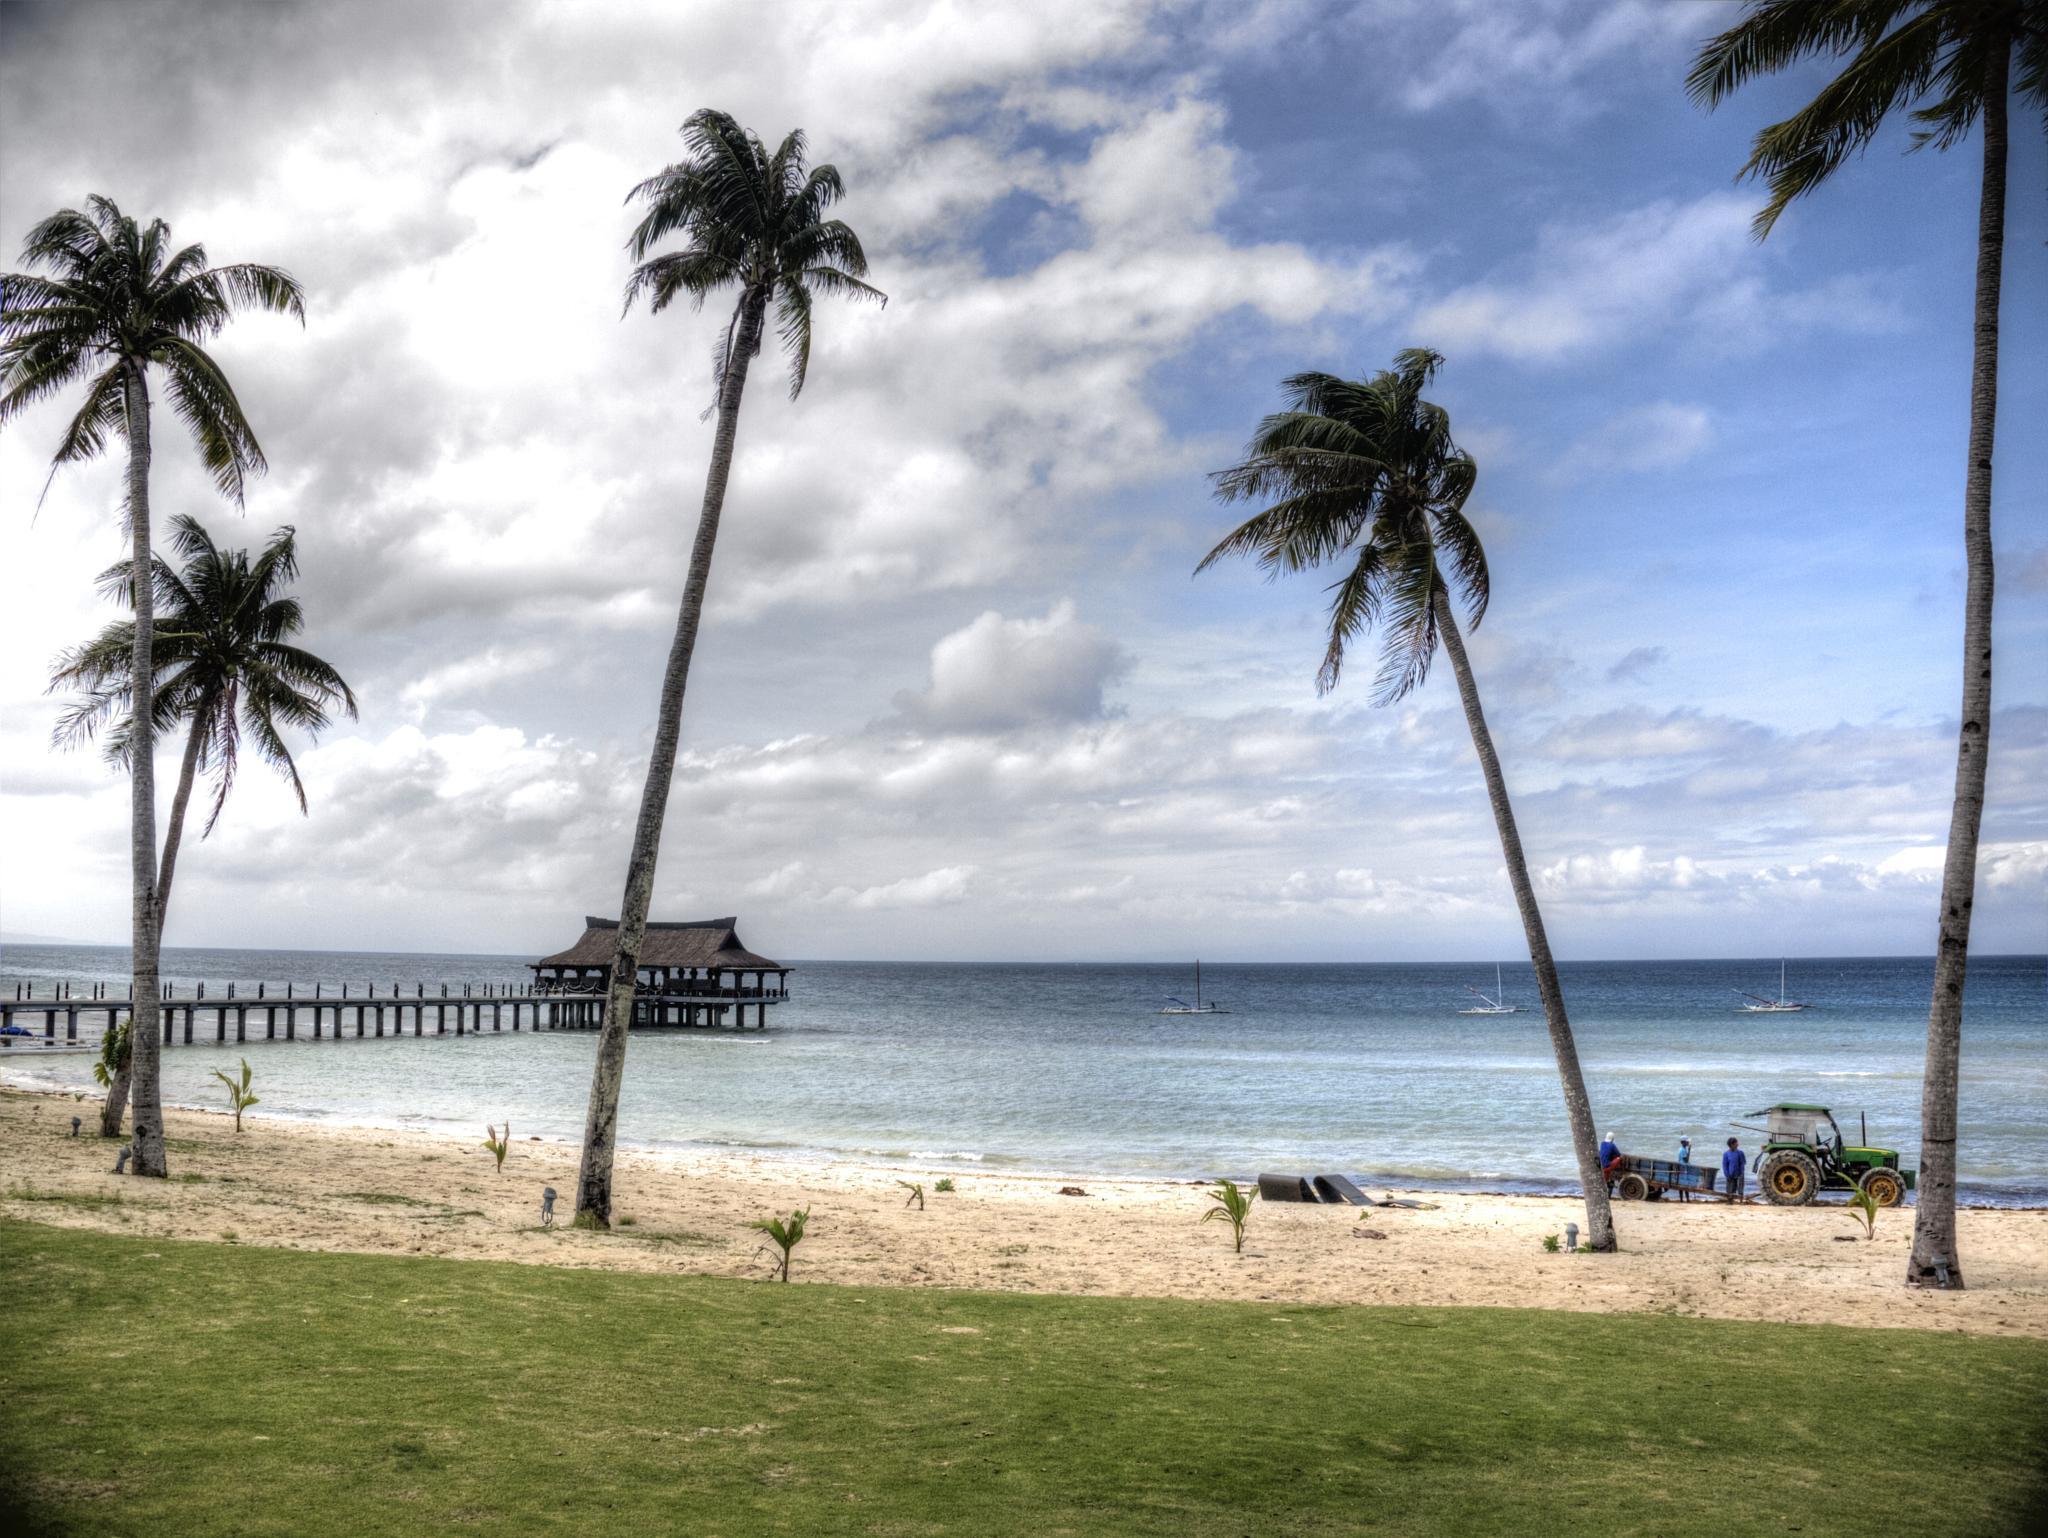 Balesin Beach 3 by Raymund Vasquez